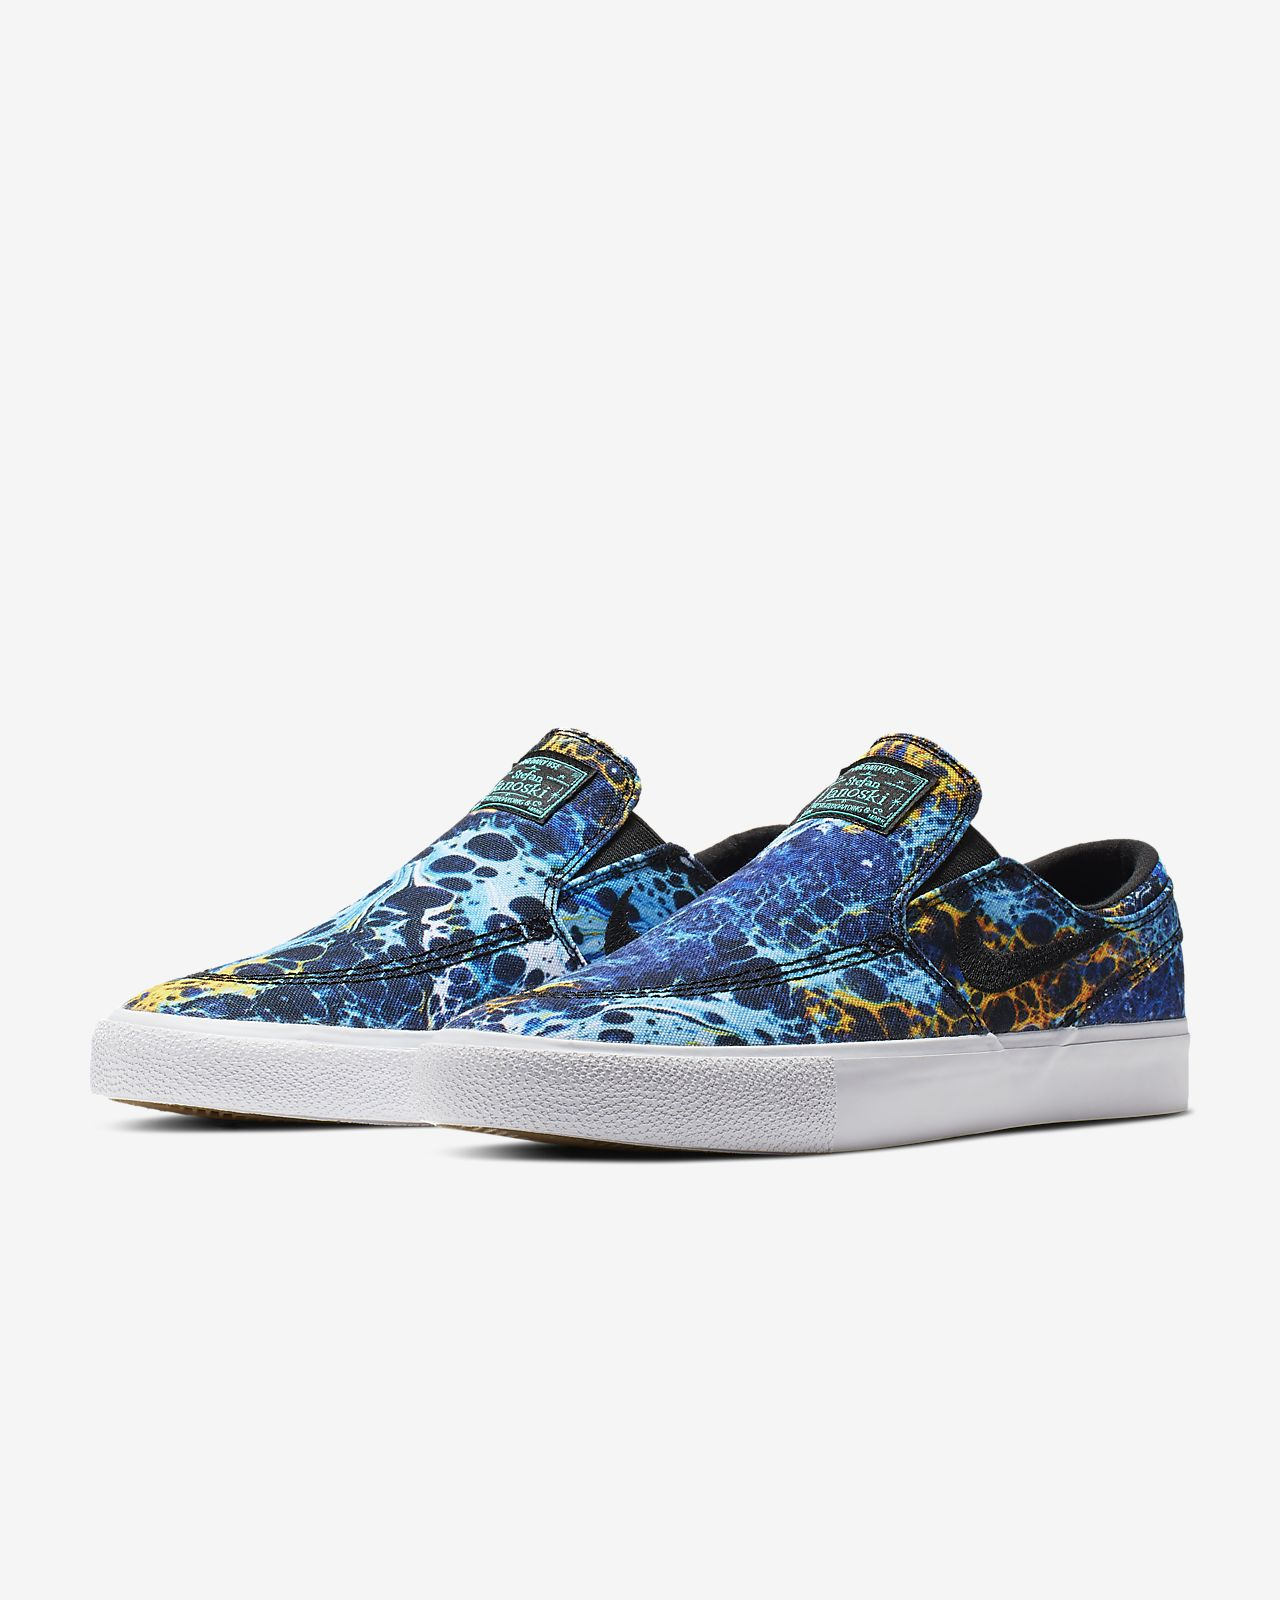 Nike SB Zoom Stefan Janoski Slip Canvas RM Premium Skate Shoe